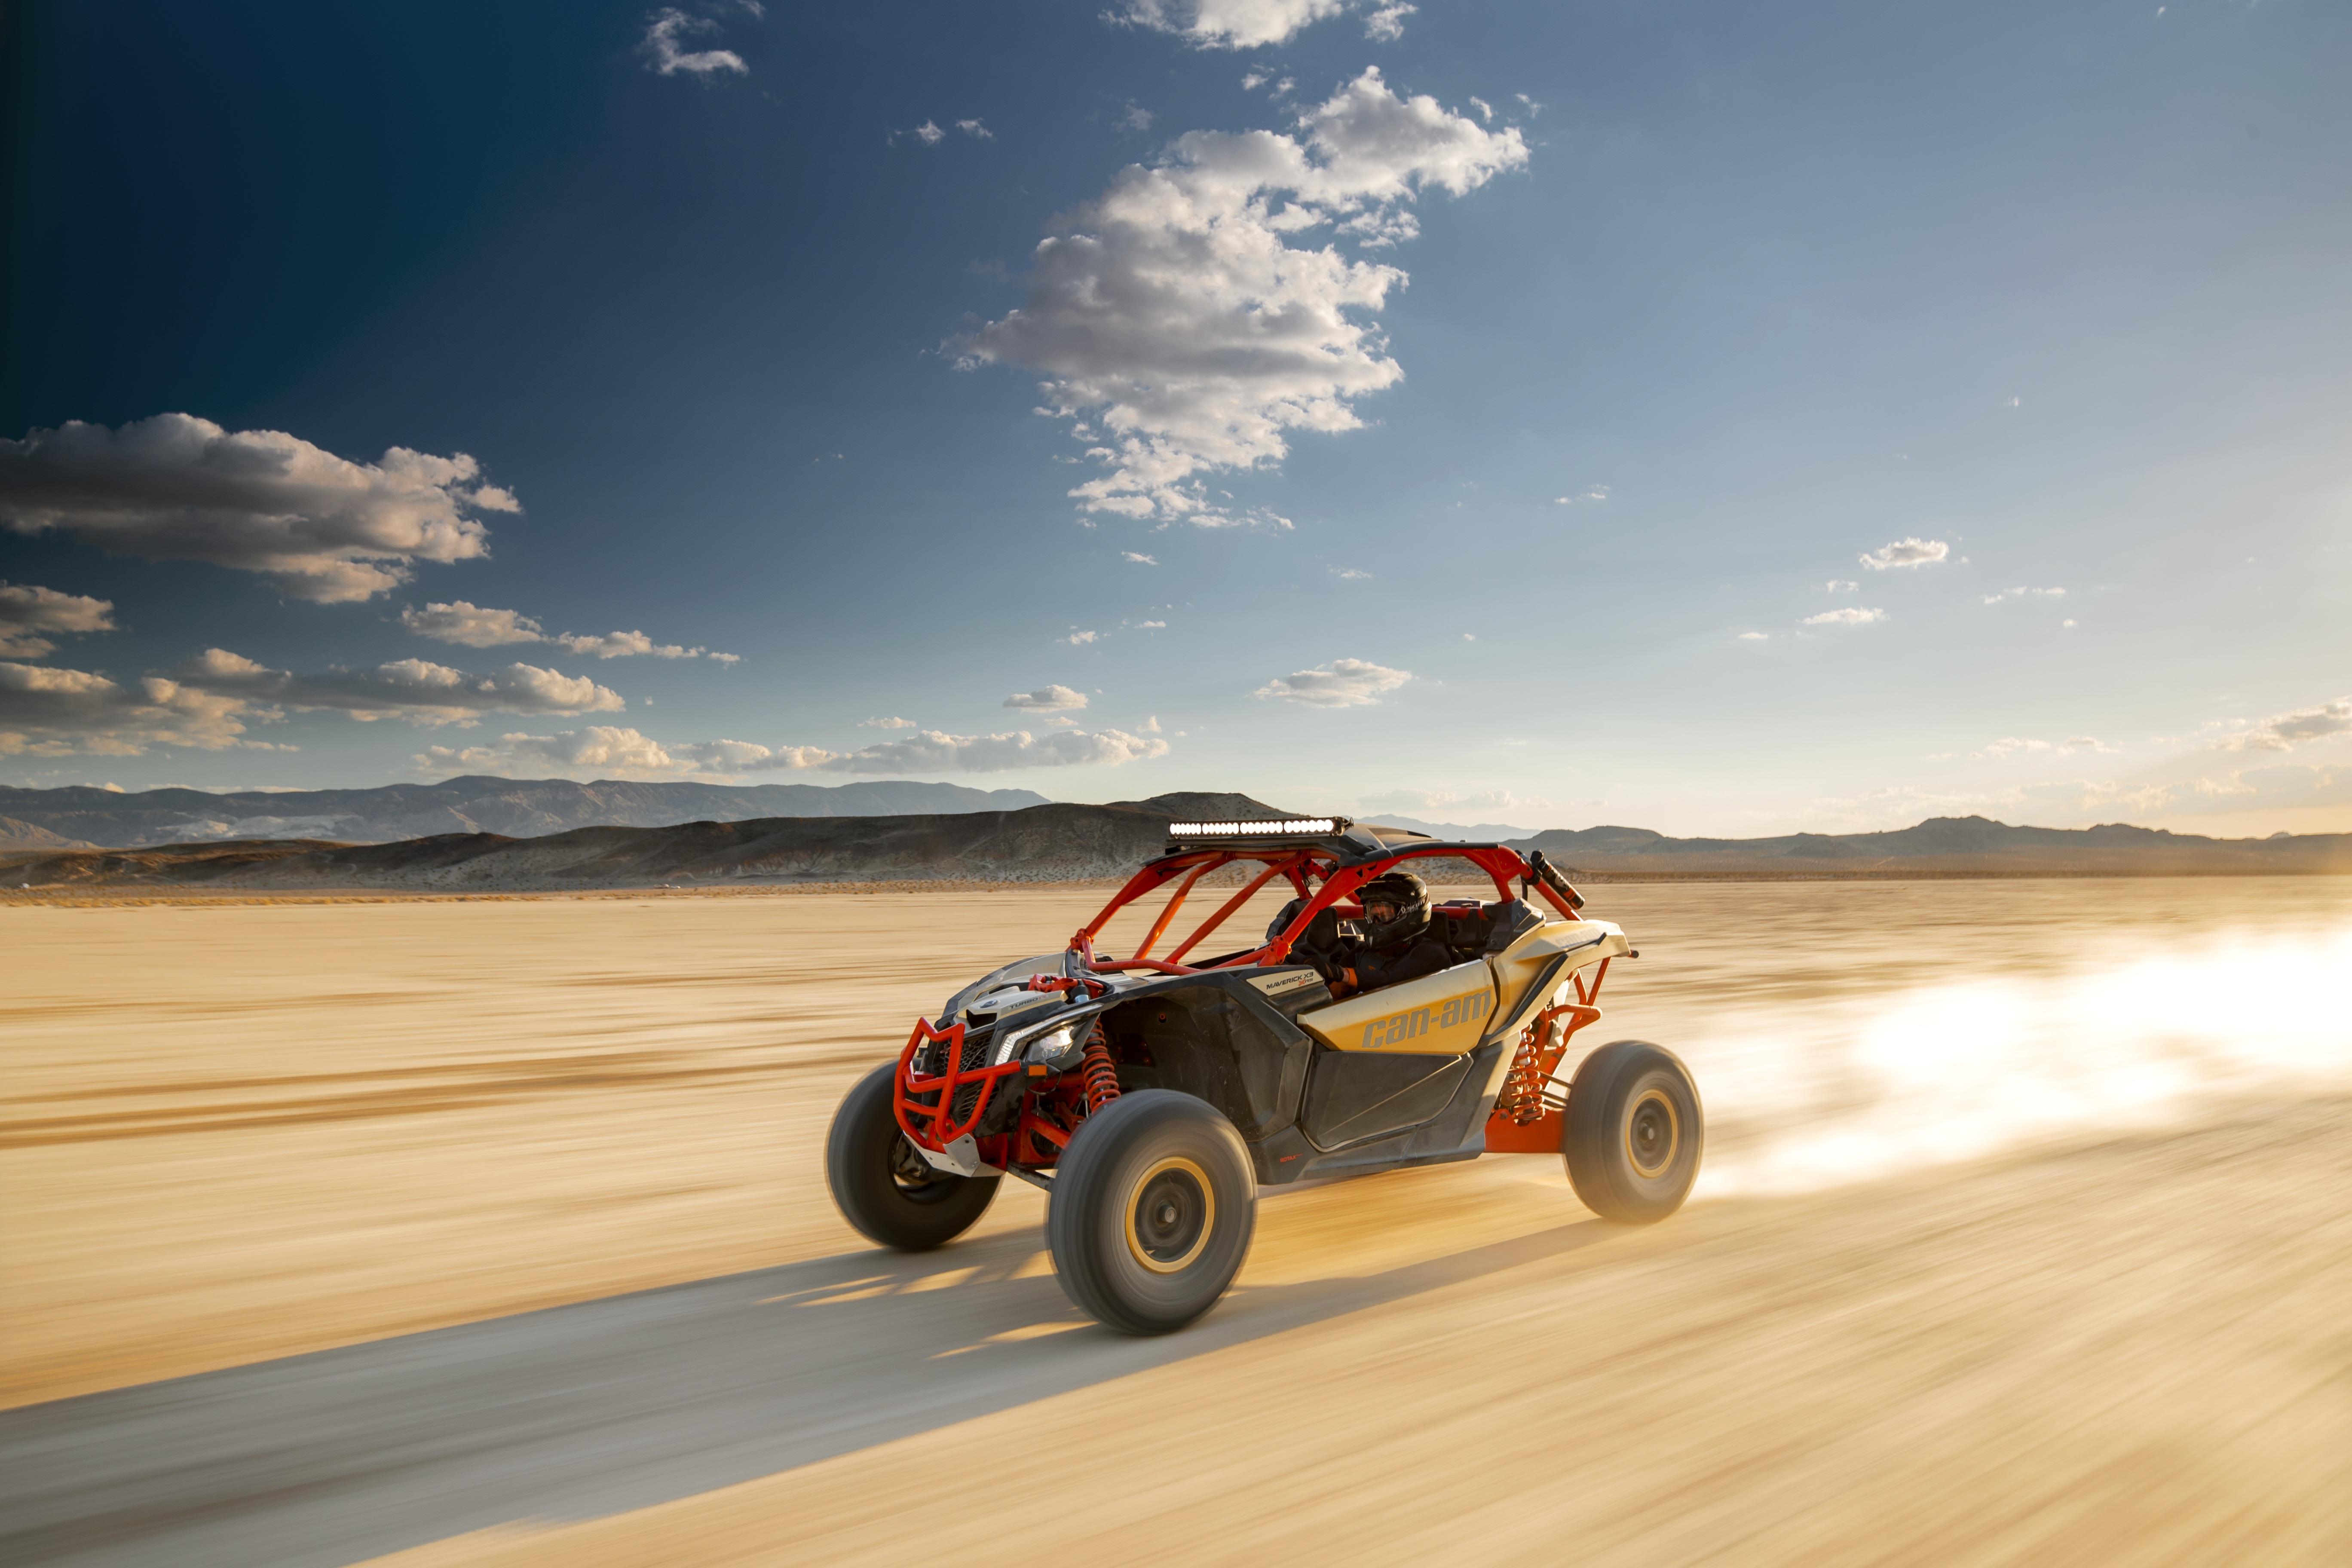 Honda Dealer Orlando >> 2017 Can-Am Maverick X3 Finally Unveiled! | Dirt Wheels Magazine